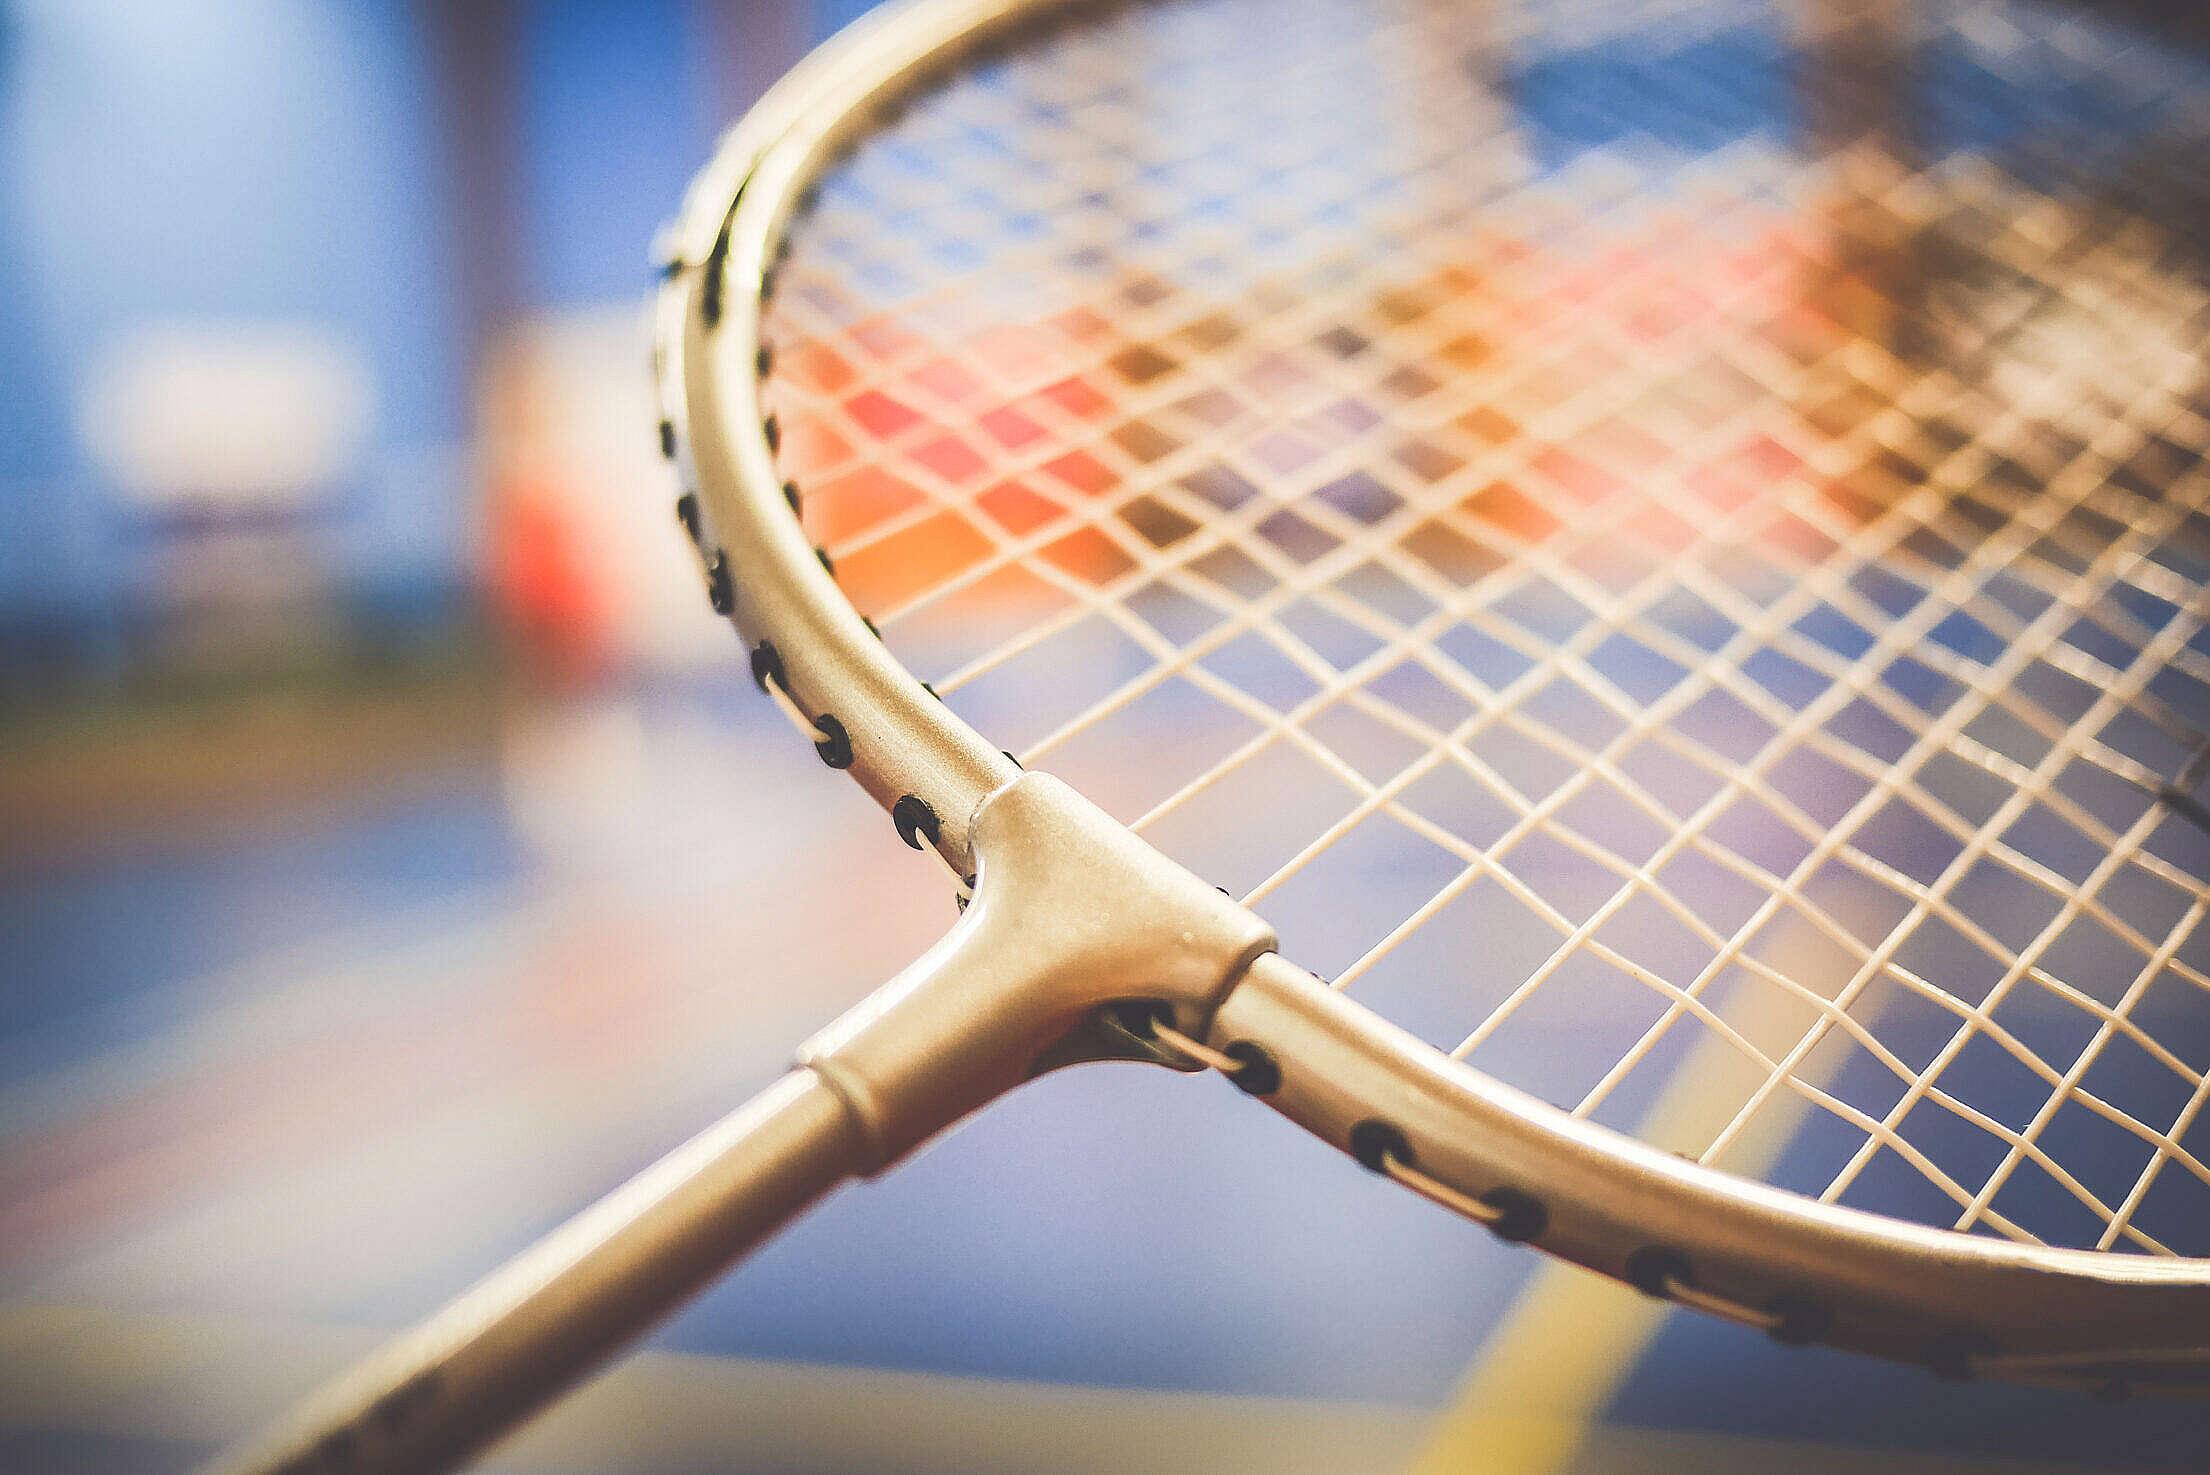 Badminton Racket Close Up Free Stock Photo